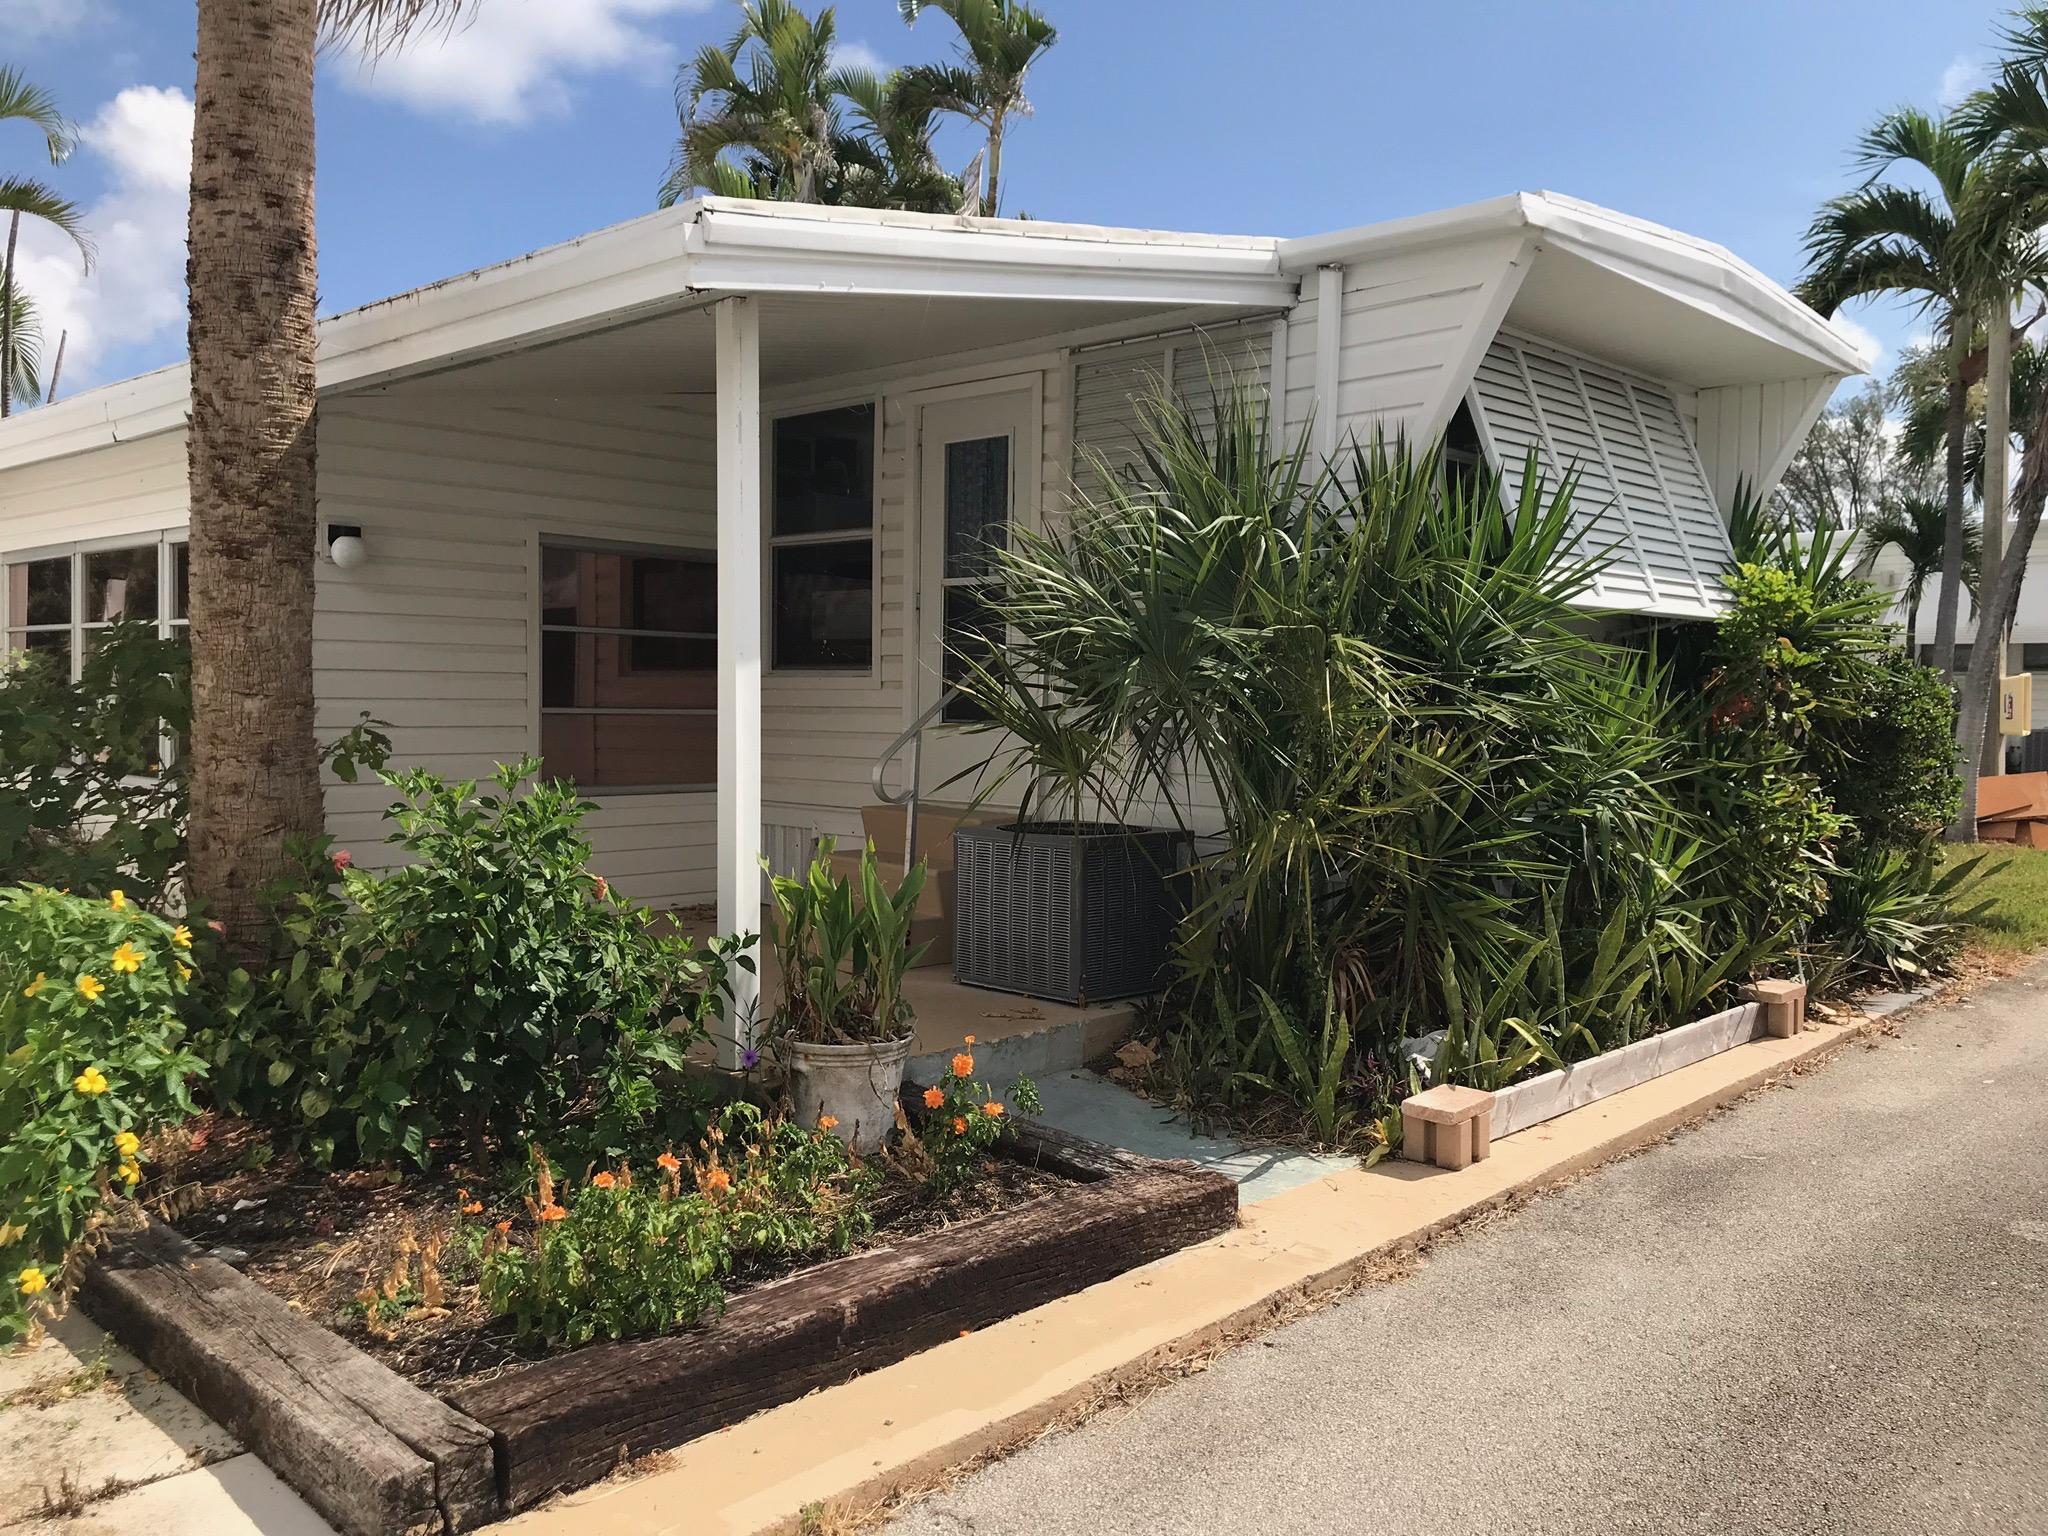 Home for sale in BRINY BREEZES INC Briny Breezes Florida